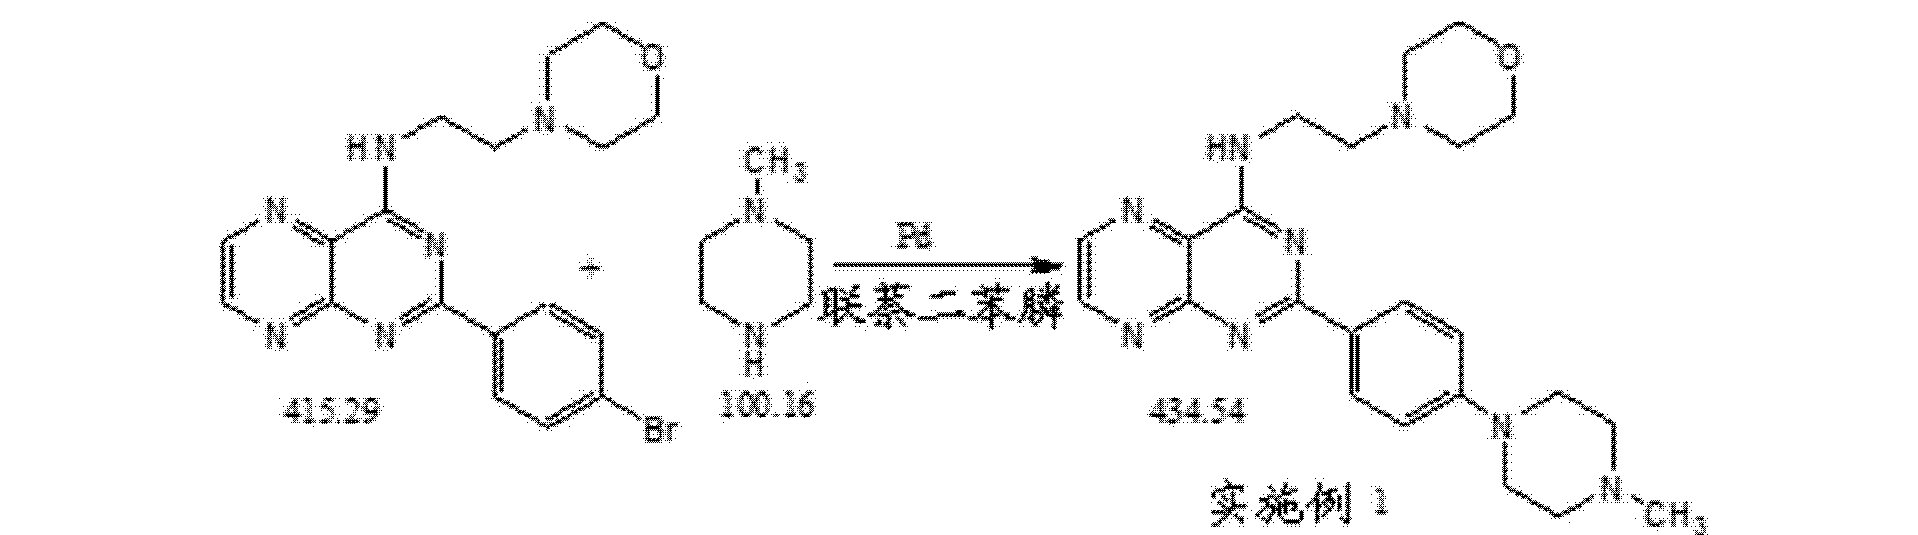 Figure CN103717070AD00871